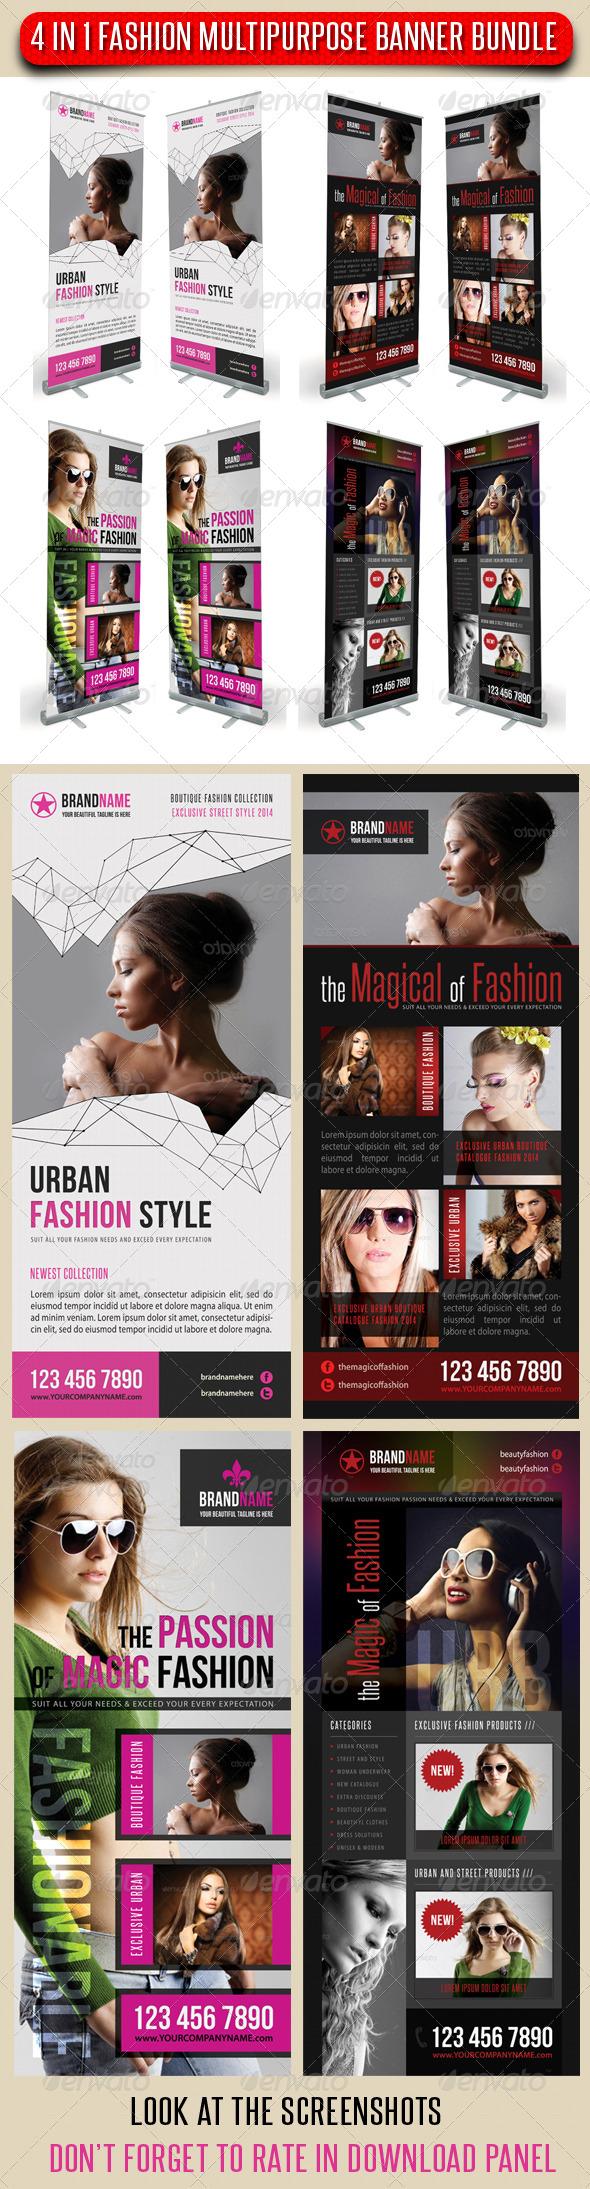 4 in 1 Fashion Multipurpose Banner Bundle 06